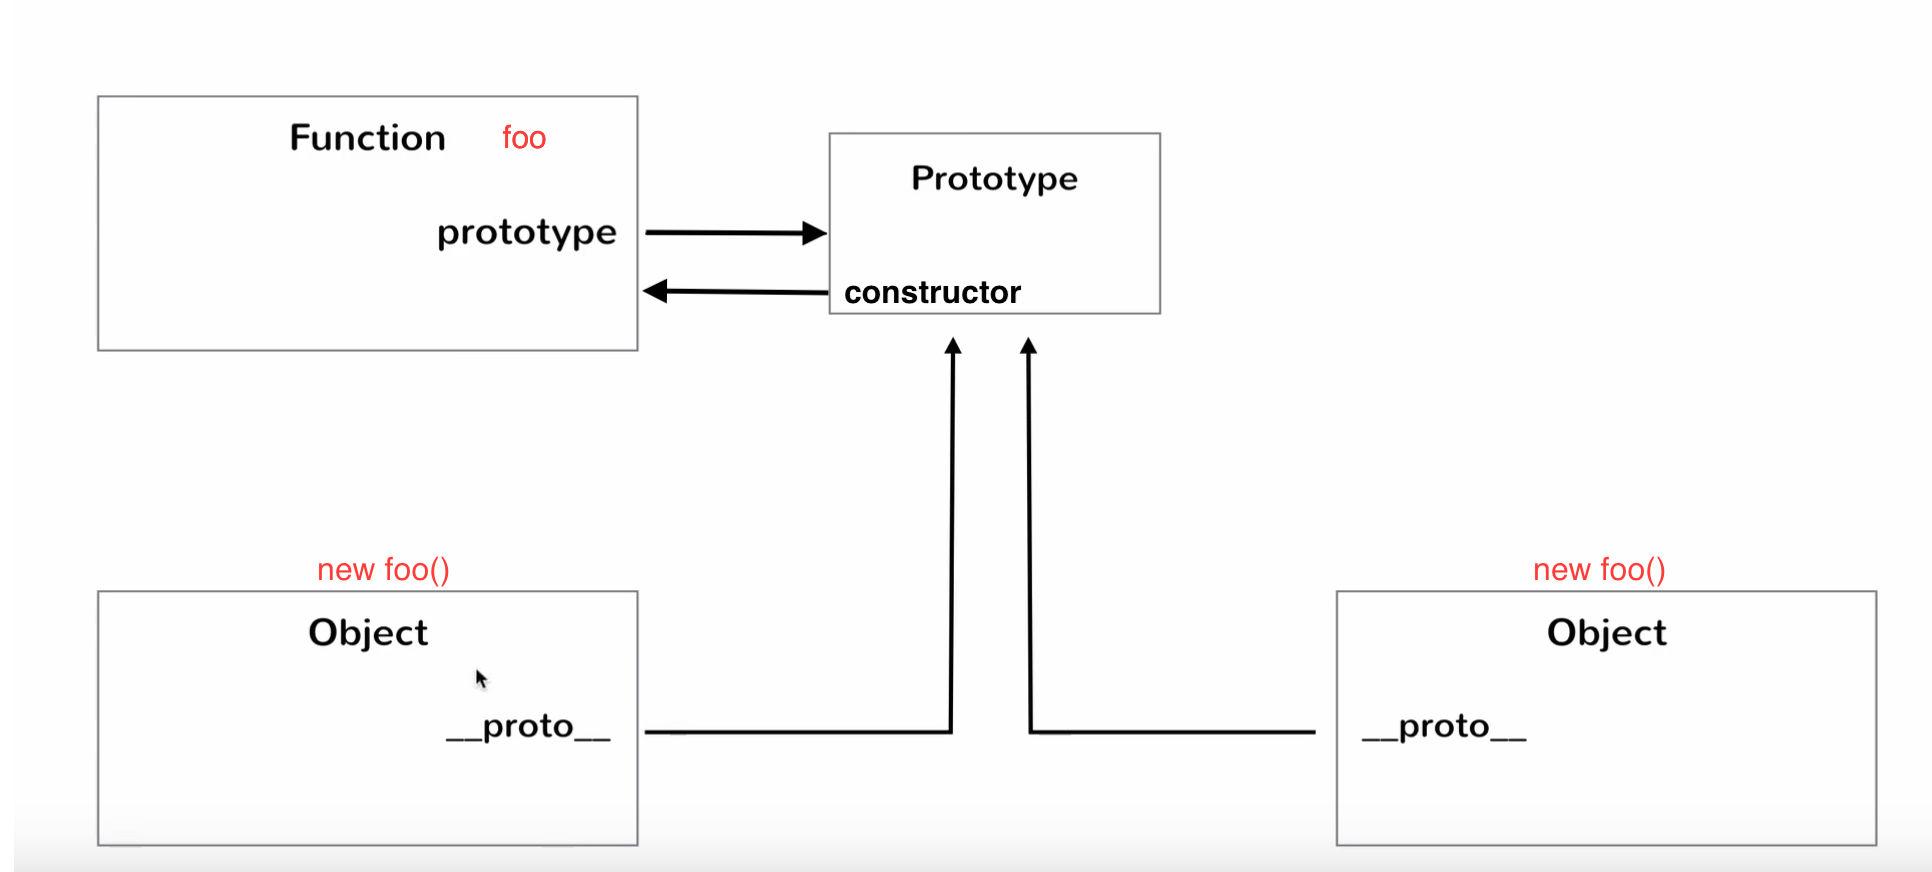 The constructor diagram